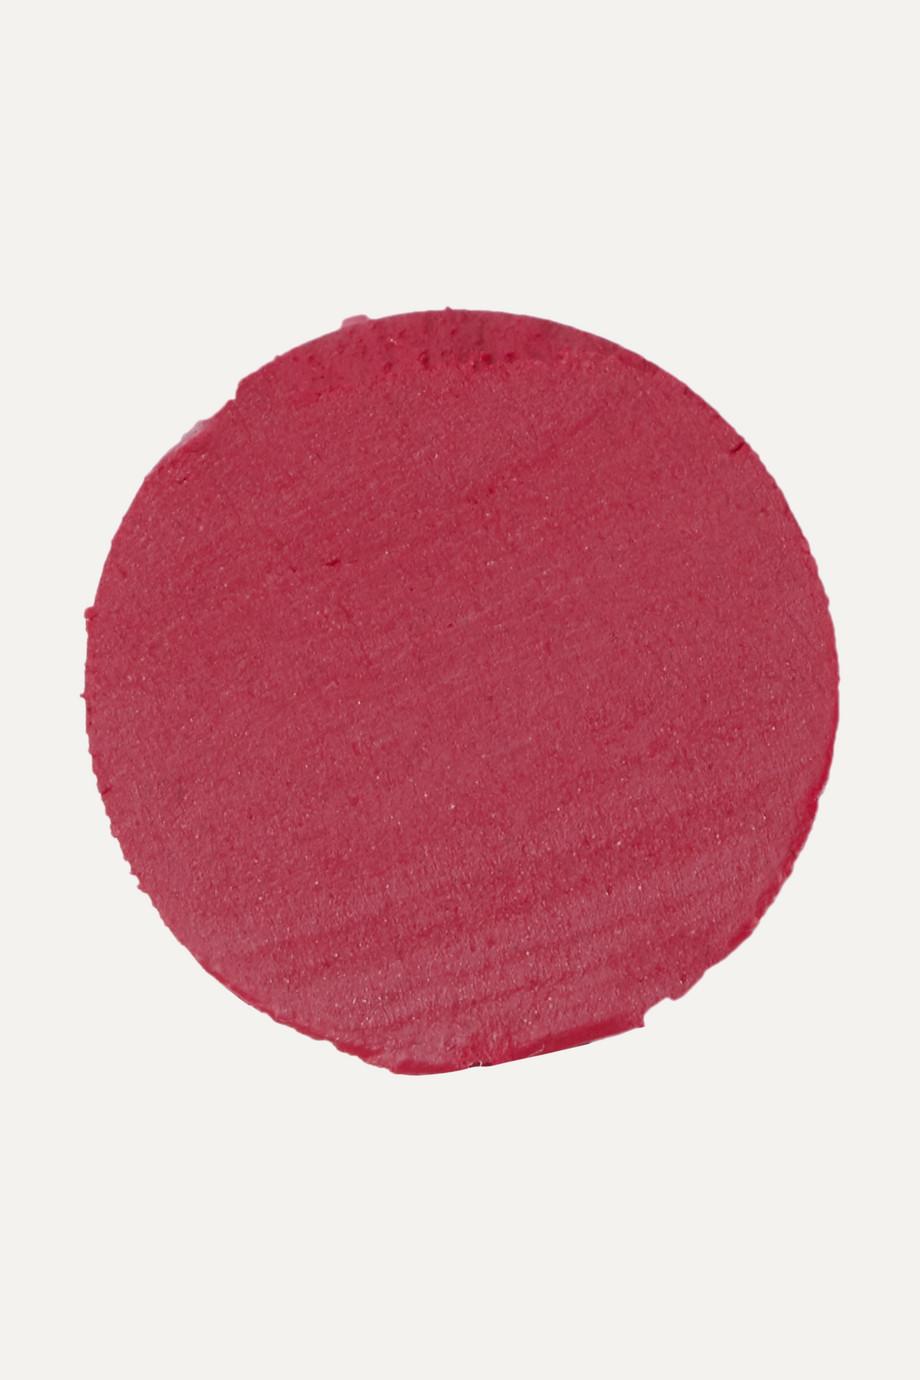 Charlotte Tilbury Hot Lips 2 Lipstick - Amazing Amal